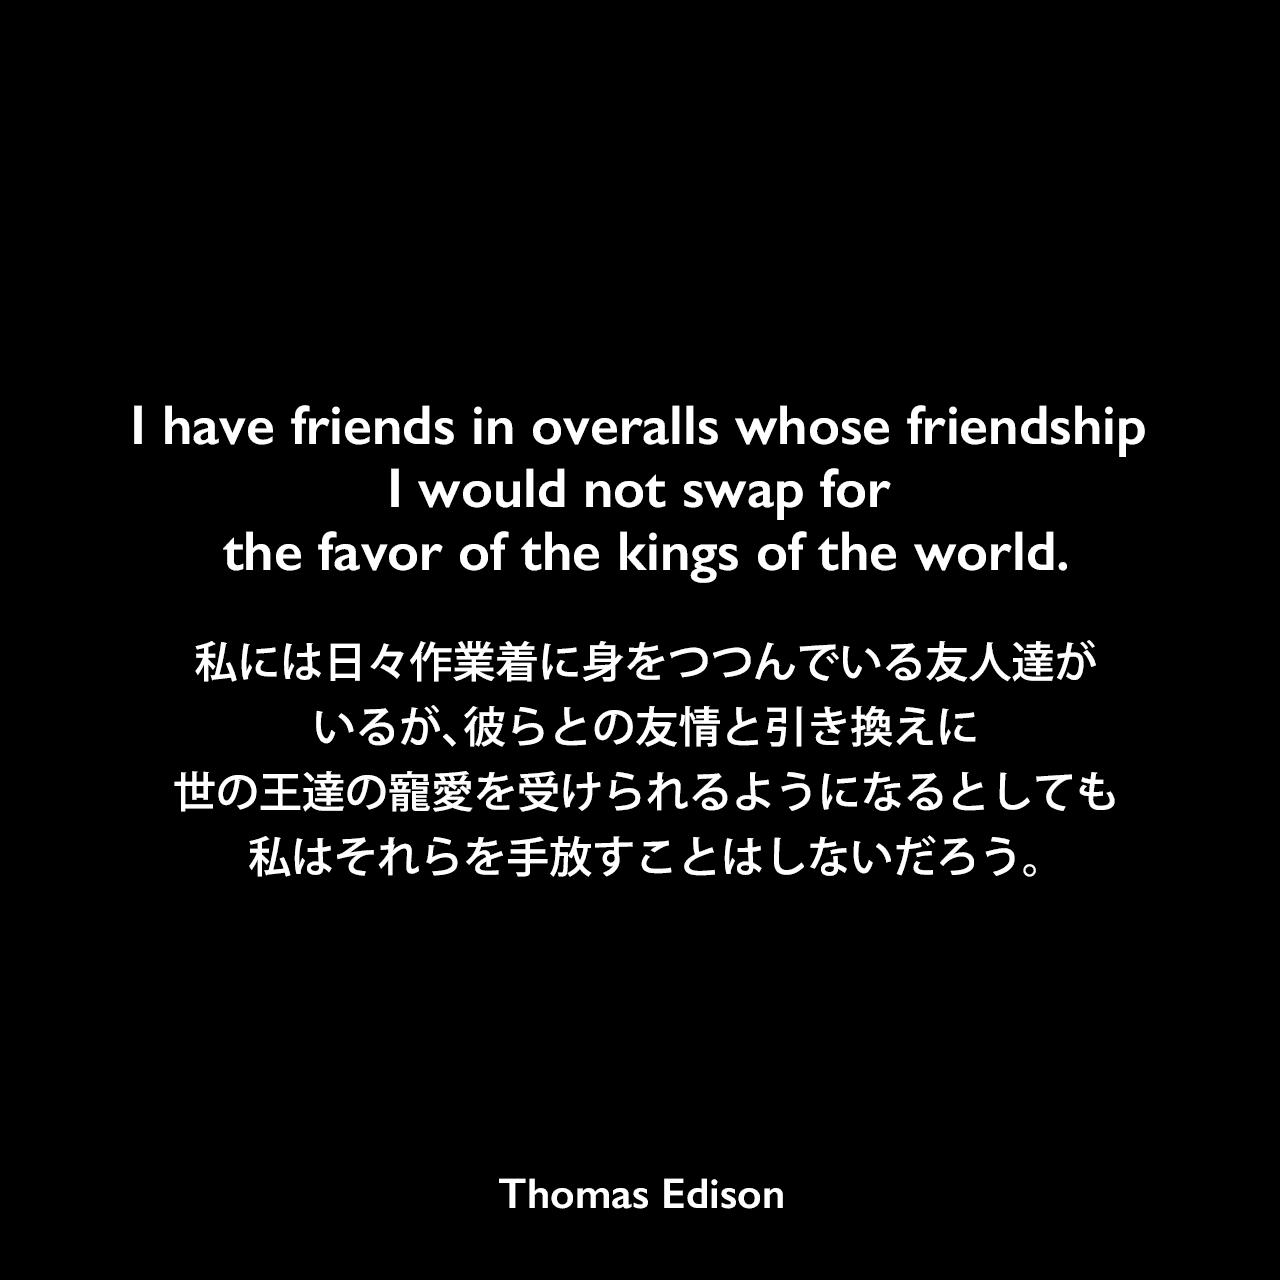 I have friends in overalls whose friendship I would not swap for the favor of the kings of the world.私には日々作業着に身をつつんでいる友人達がいるが、彼らとの友情と引き換えに世の王達の寵愛を受けられるようになるとしても、私はそれらを手放すことはしないだろう。- Edison Innovation FoundationよりThomas Edison